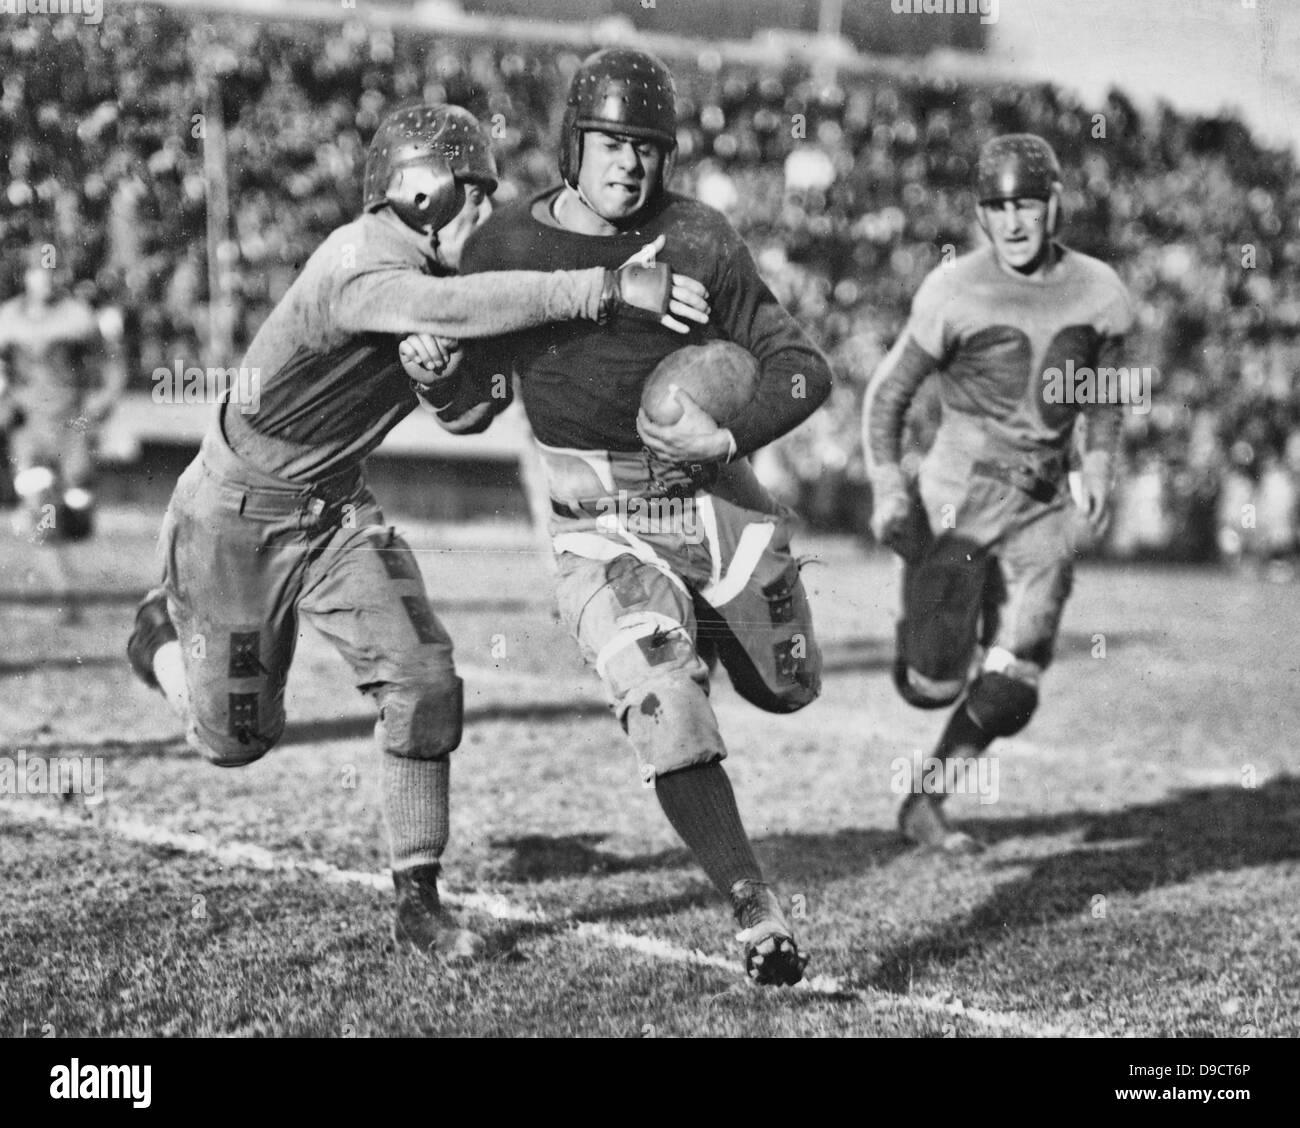 Football Game - Vintage American football, circa 1925 - Stock Image